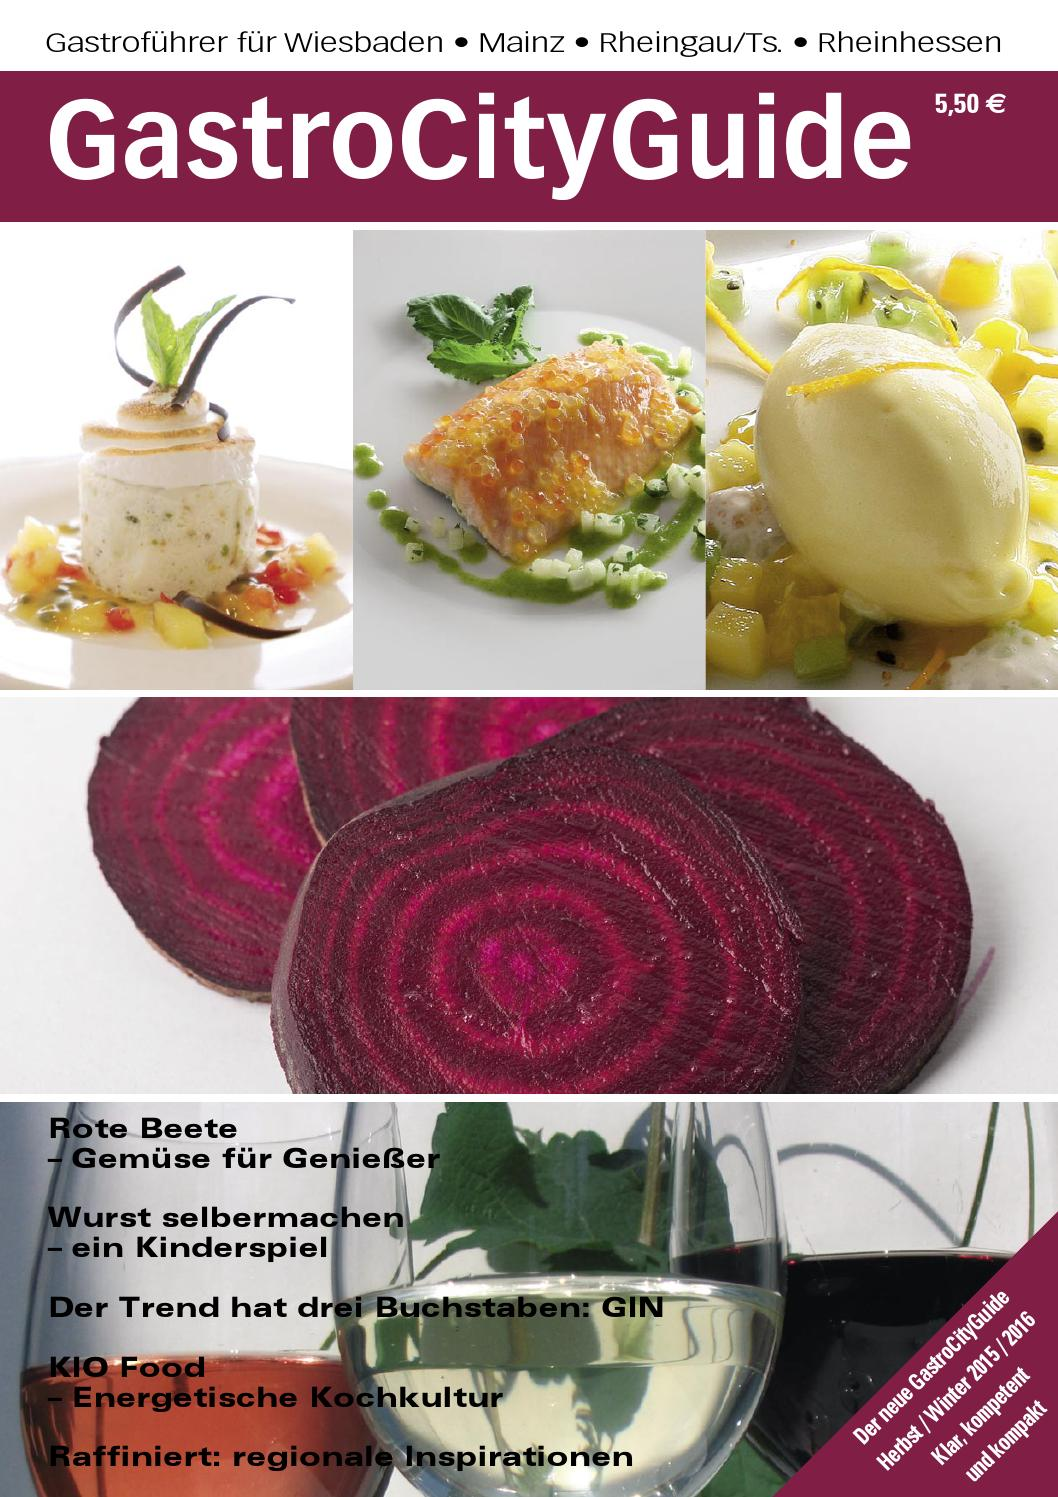 GastroCityGuide, Ausgabe 2 / 2015 by Petra Esser - issuu